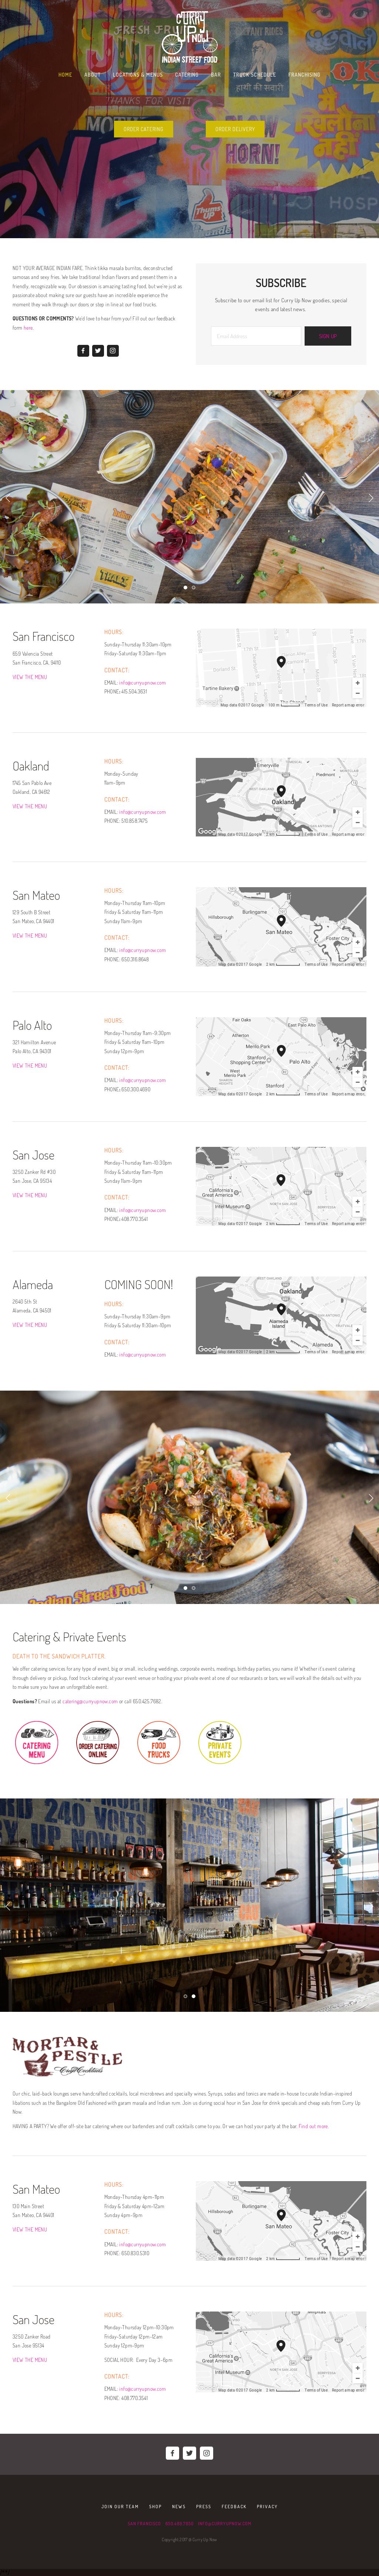 Tava Kitchen Competitors, Revenue and Employees - Owler Company Profile